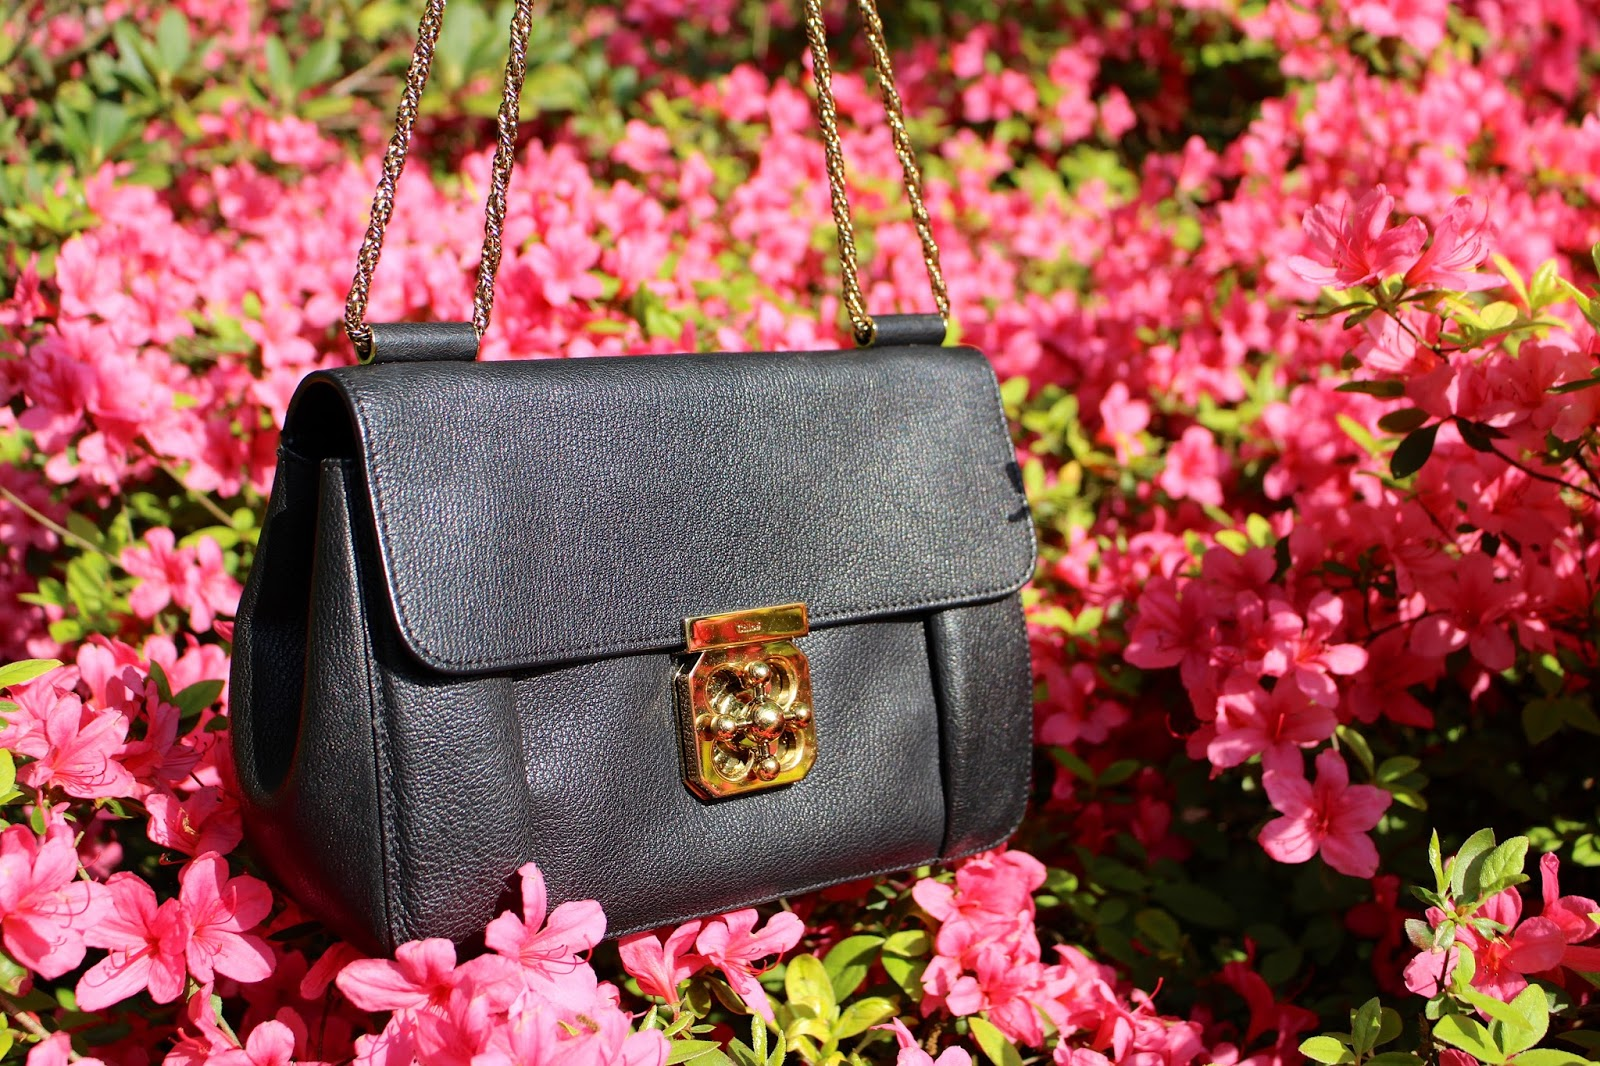 Chloe Elsie designer handbag photography